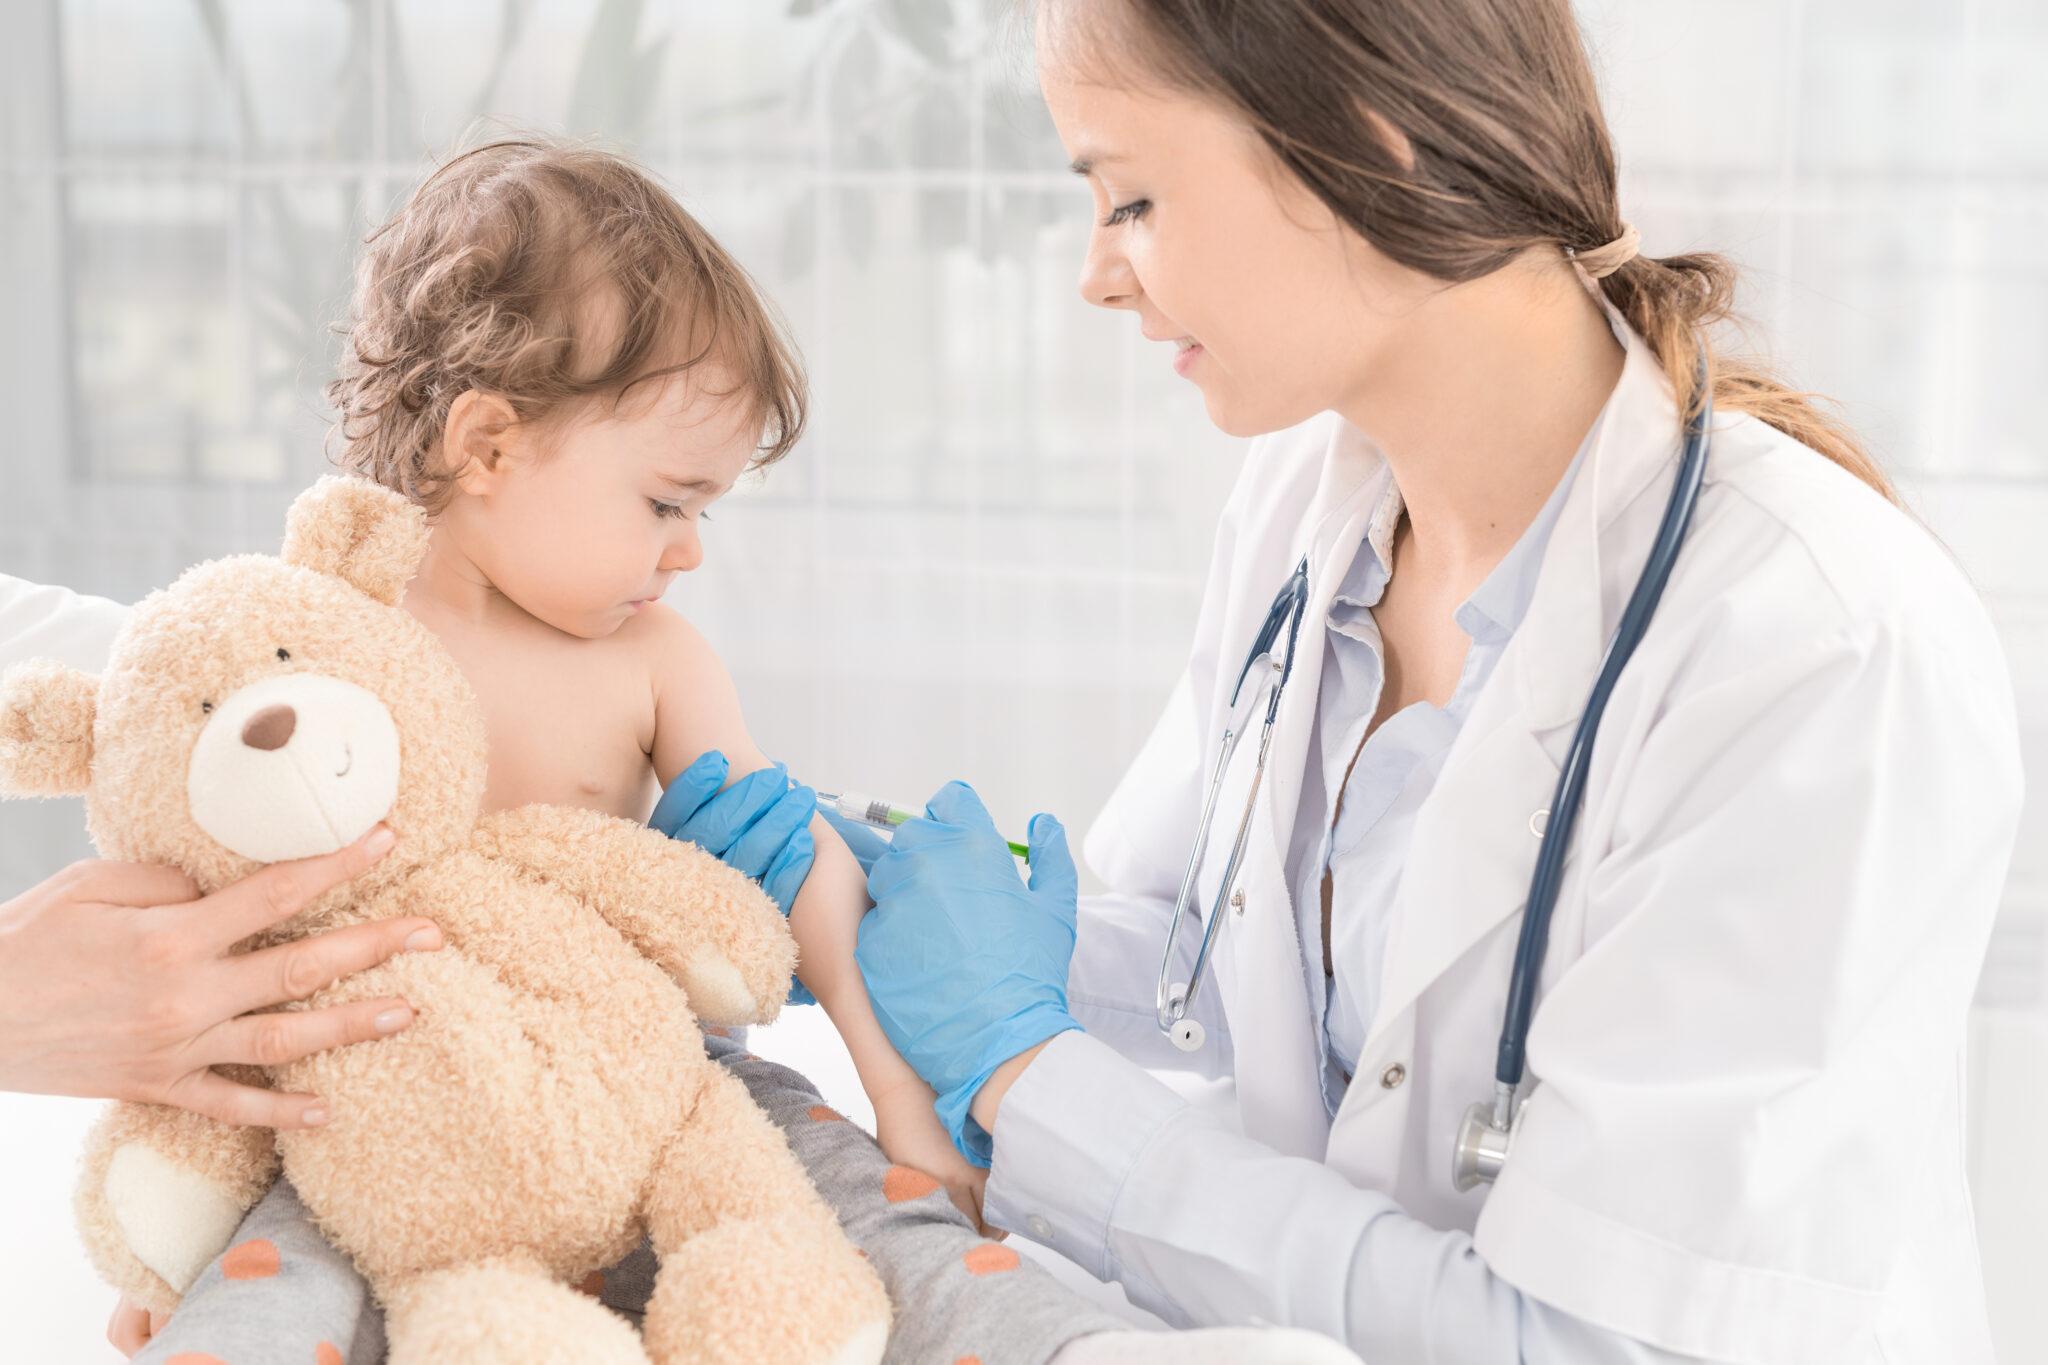 Arzt impft Kind